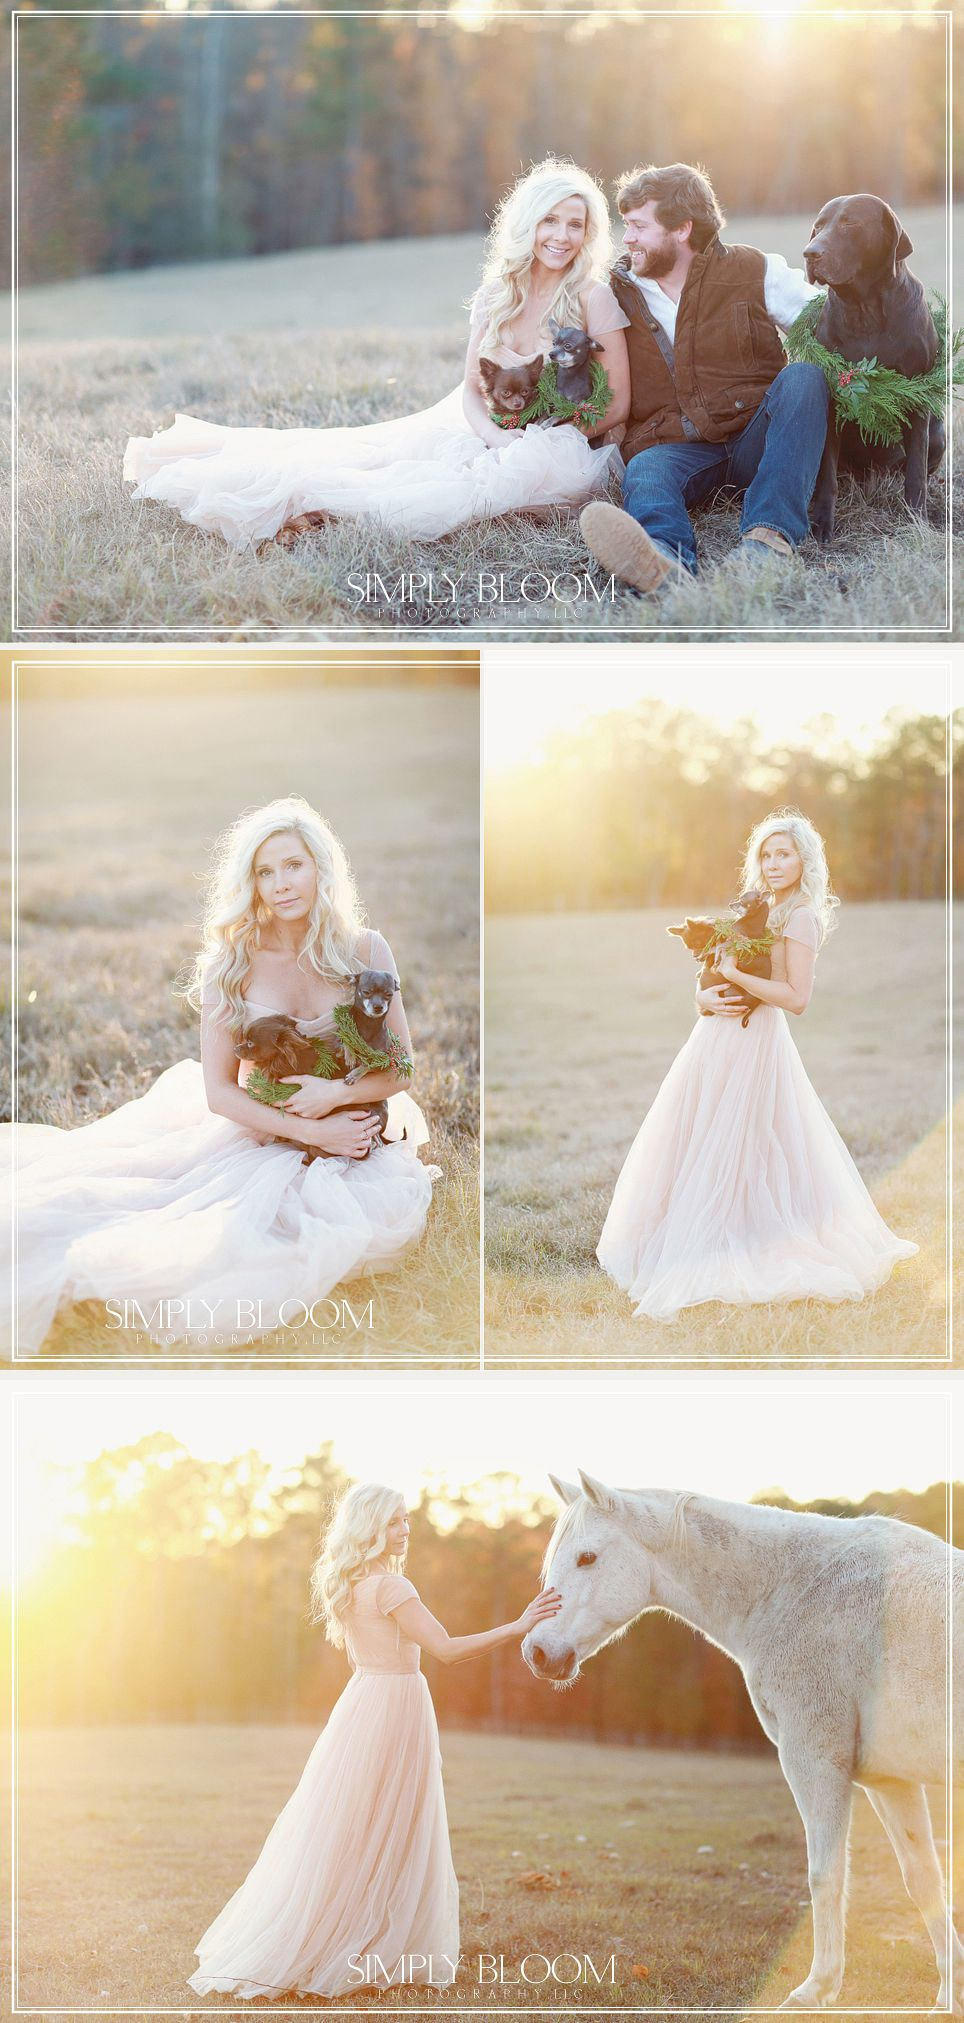 Wedding dress huntsville al  sunset wedding photography birmingham al wedding photographers